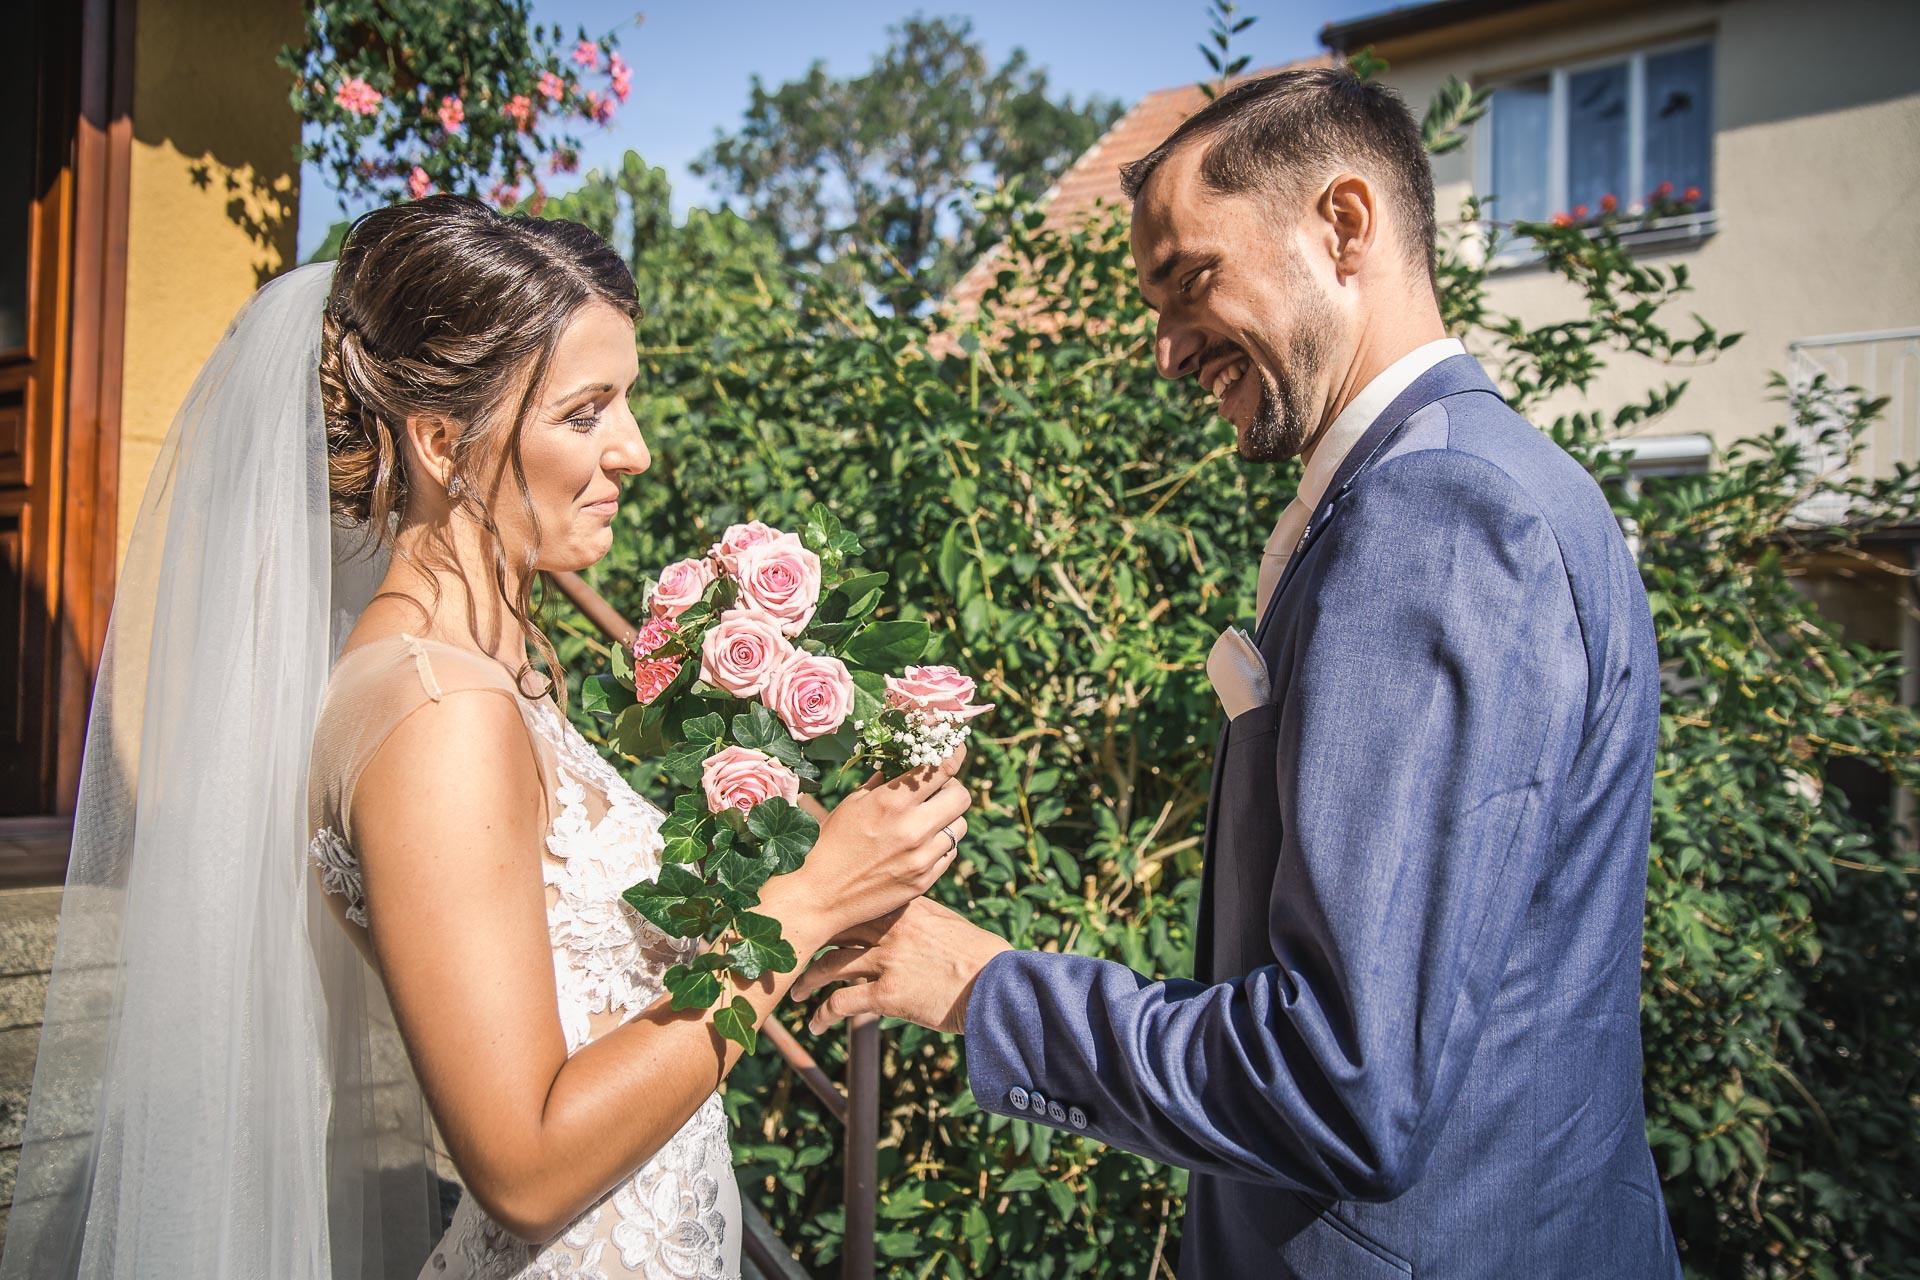 svatební-fotograf-wedding-svatebni-video-orlík-vltava-kostel-statek-stodola-boho-svatba-Beautyfoto-125